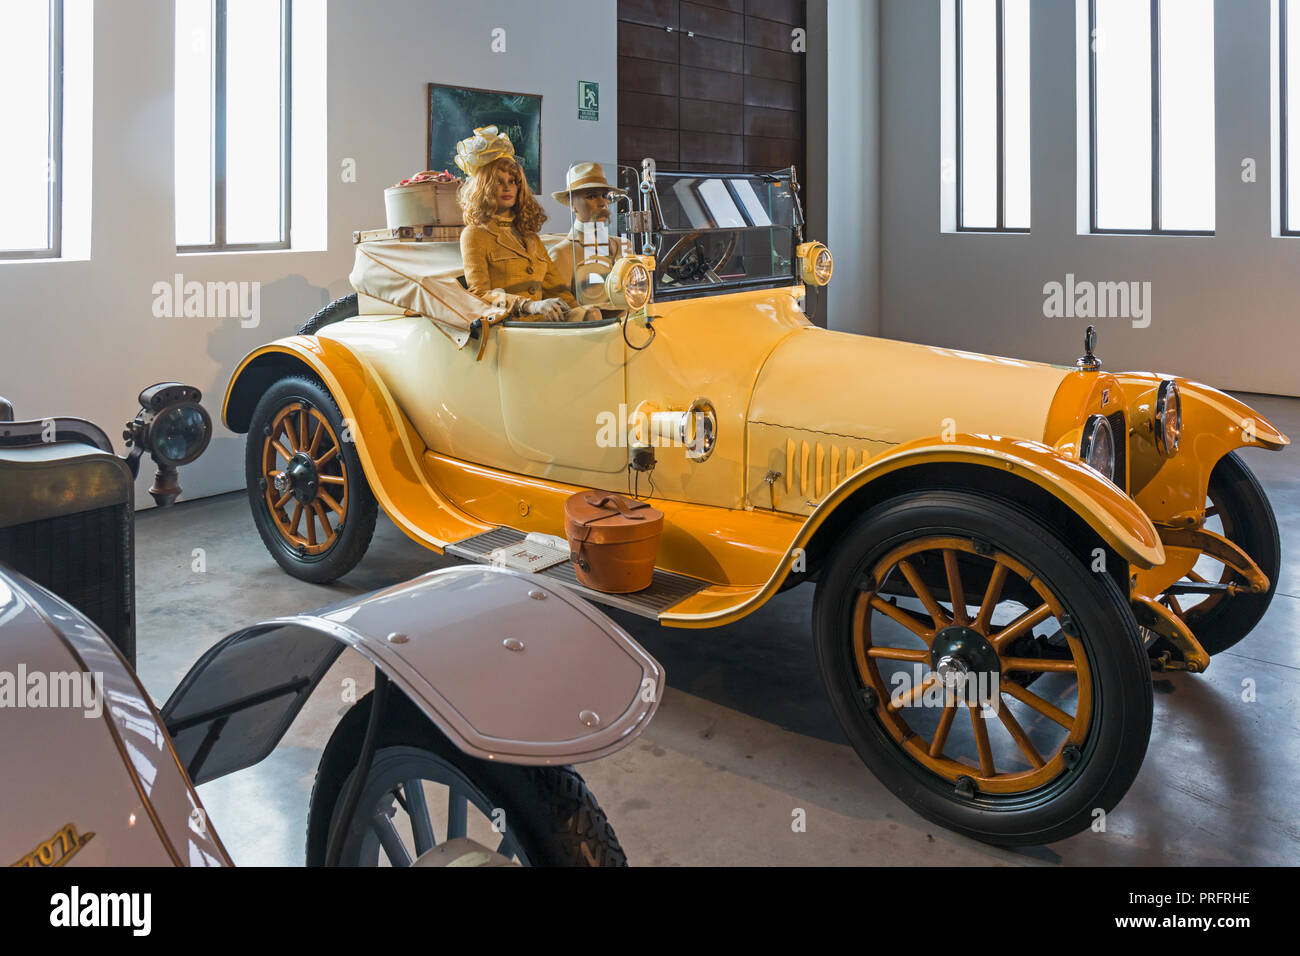 Museo Automovilistico y de la Moda, Malaga, Malaga Province, Spain.  Automobile and Fashion Museum.  6 cylinder, 45 HP, 3700 cc Model D44 American Bui - Stock Image